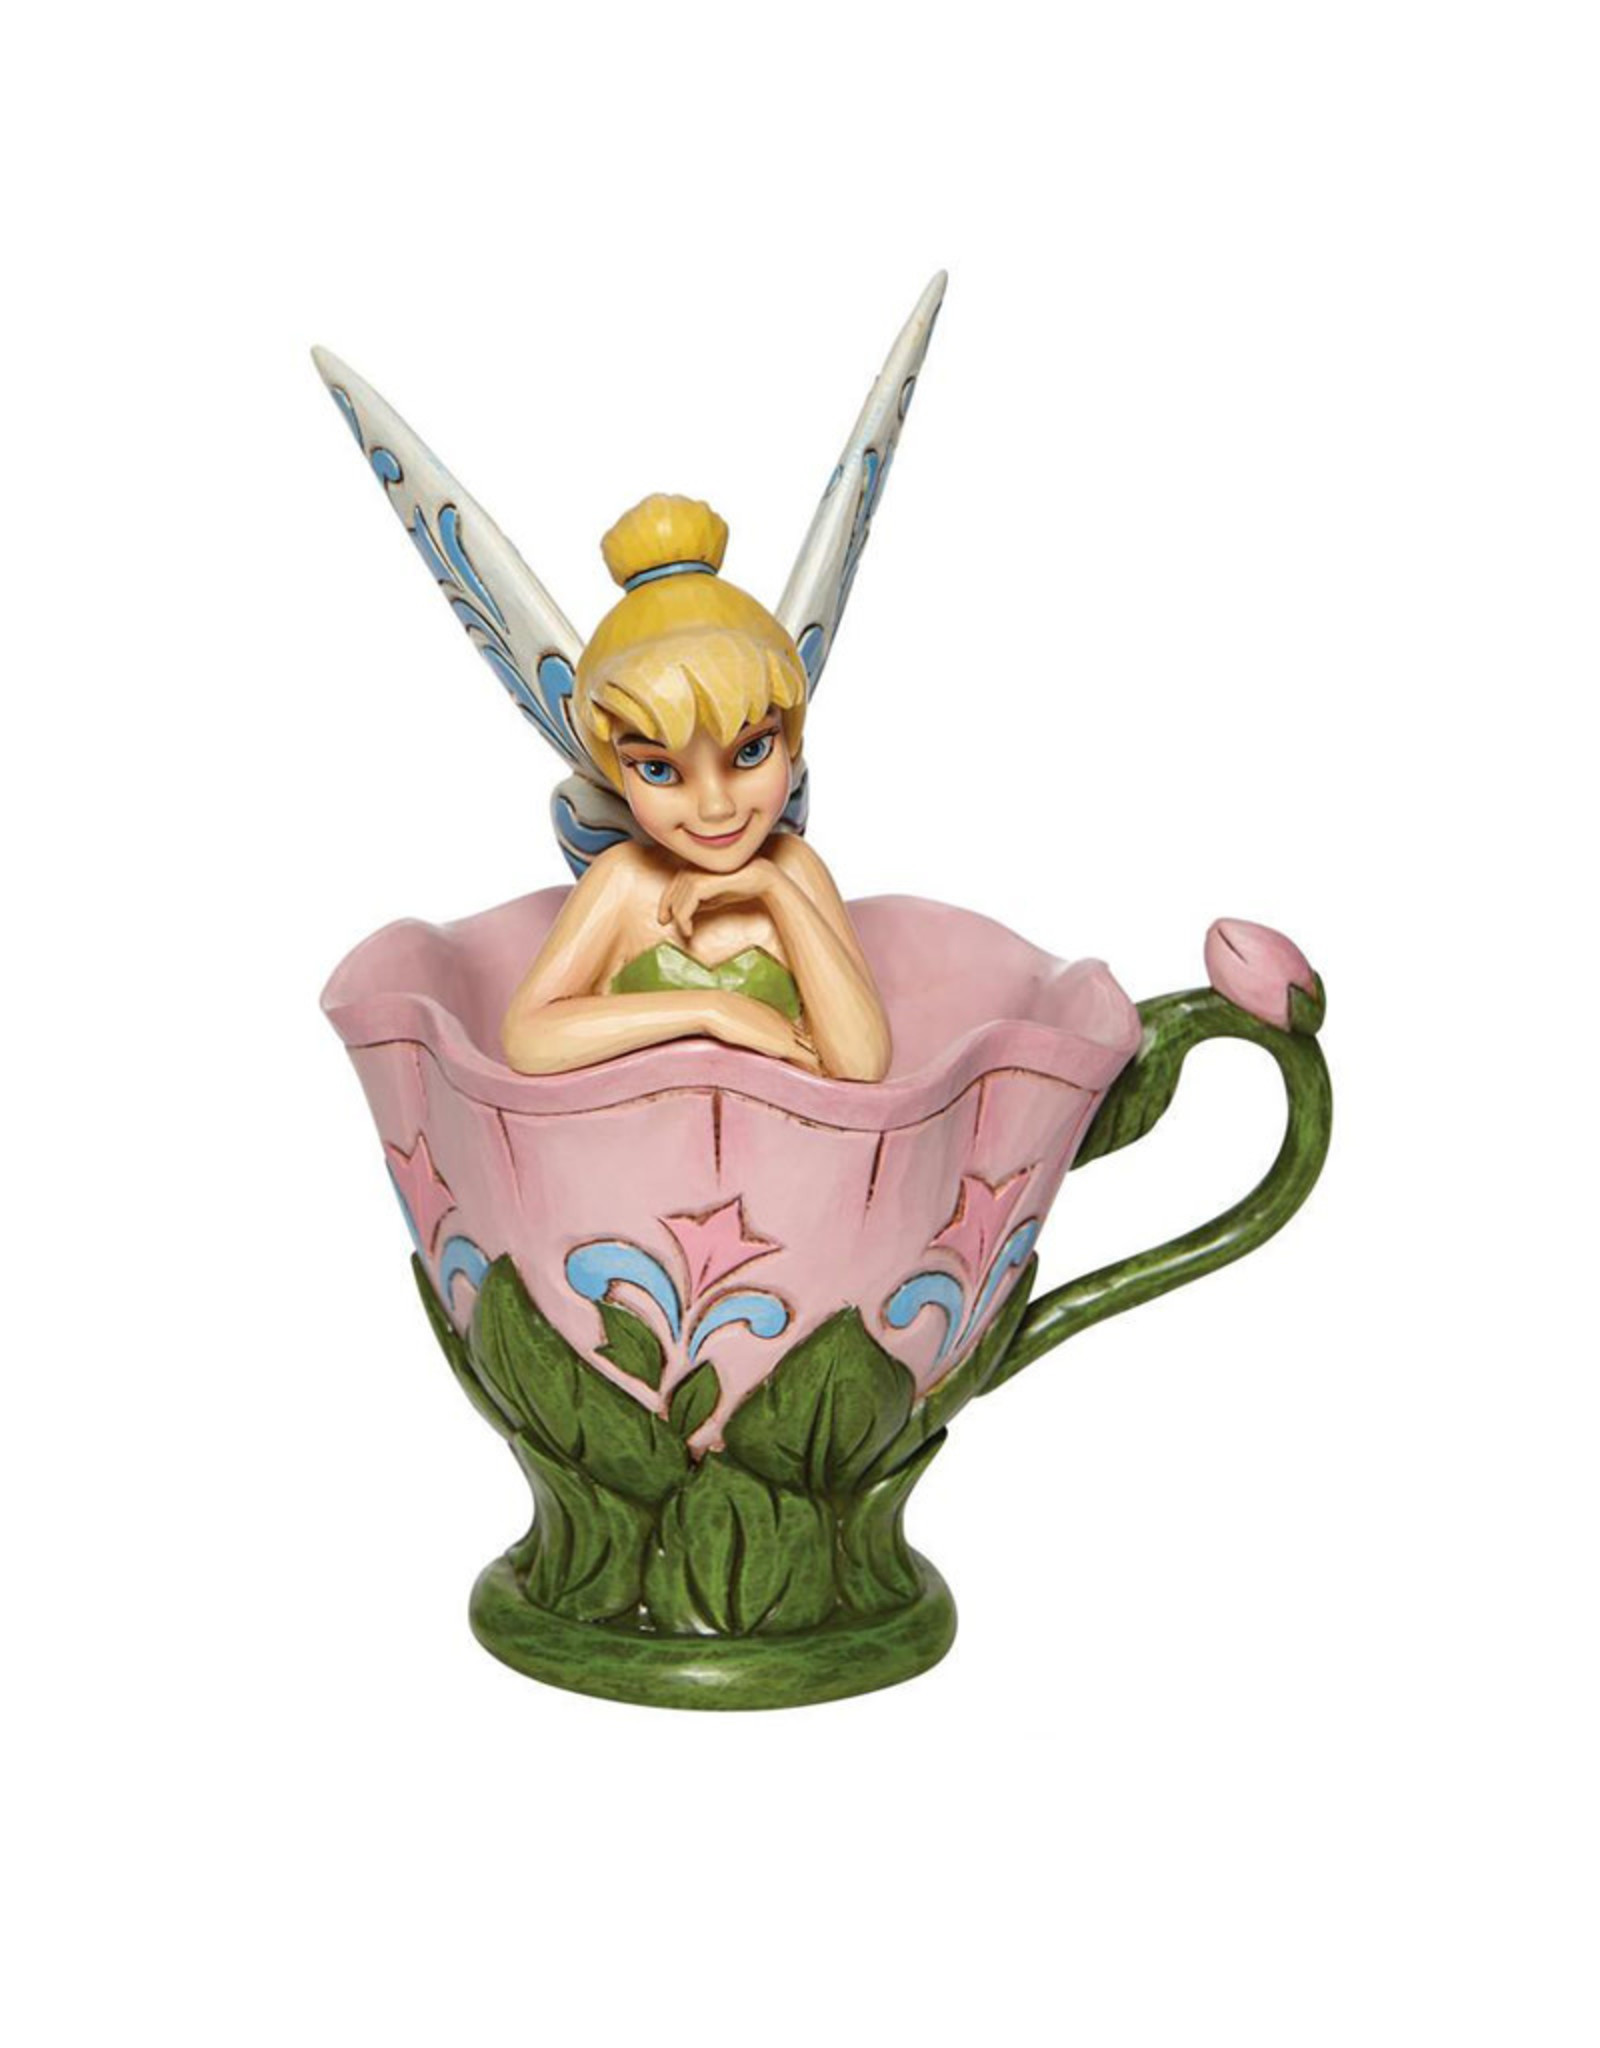 Disney Disney ( Disney Traditions Figurine ) Tinkerbell Cup